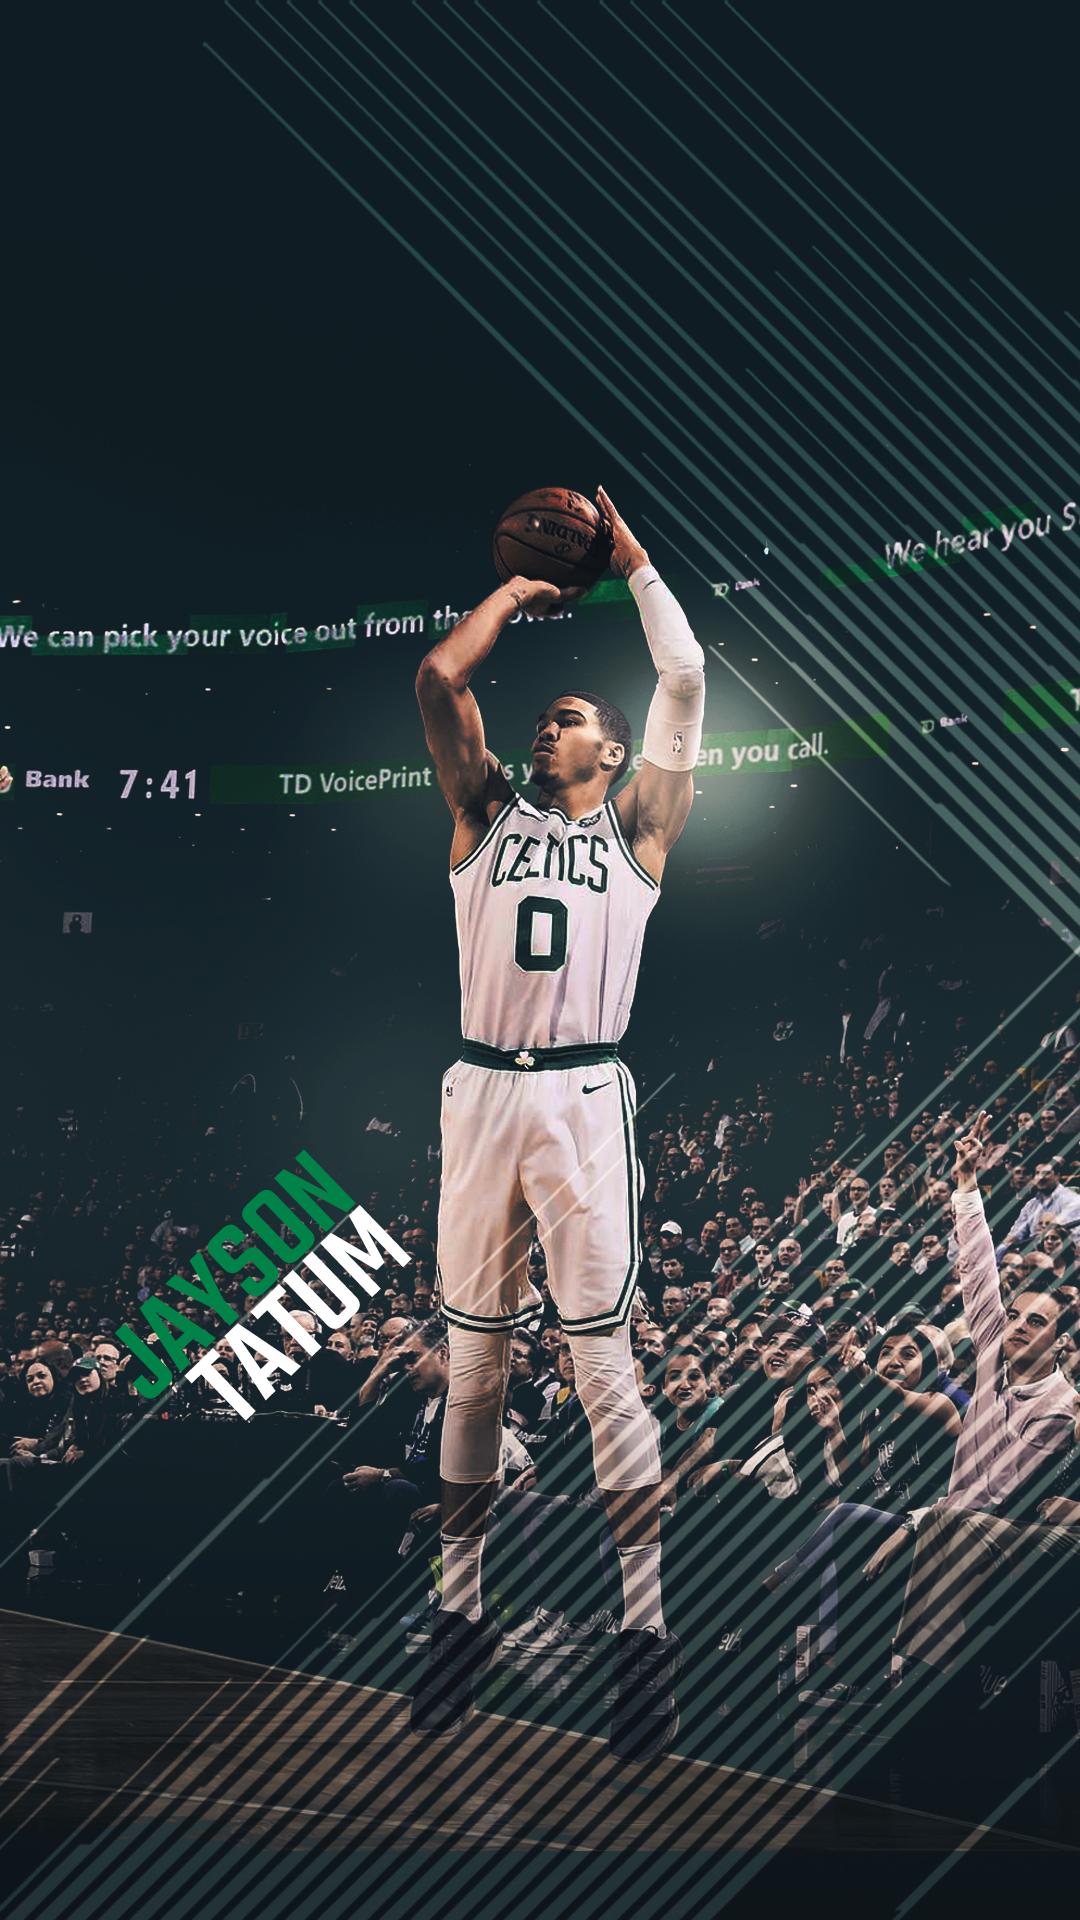 Boston Celtics Wallpaper Iphone Jayson Tatum Boston Celtics Wallpaper Nba Pictures Jayson Tatum